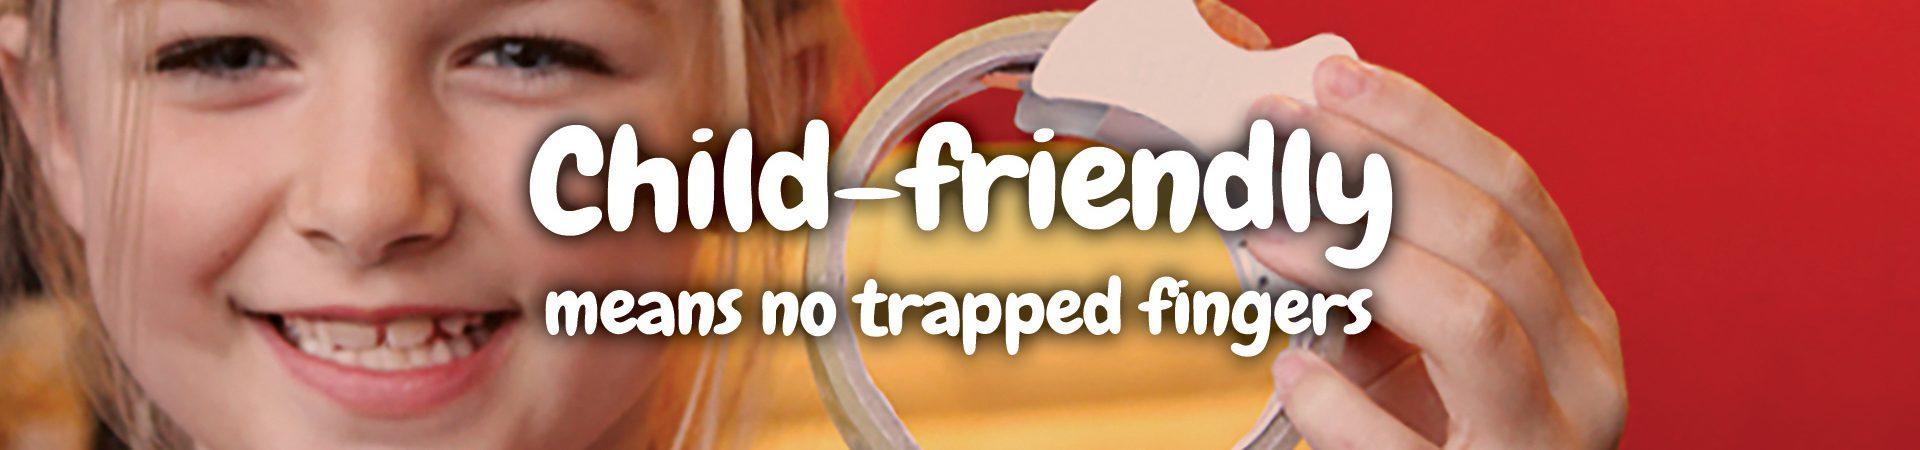 tape dispenser thats child friendly